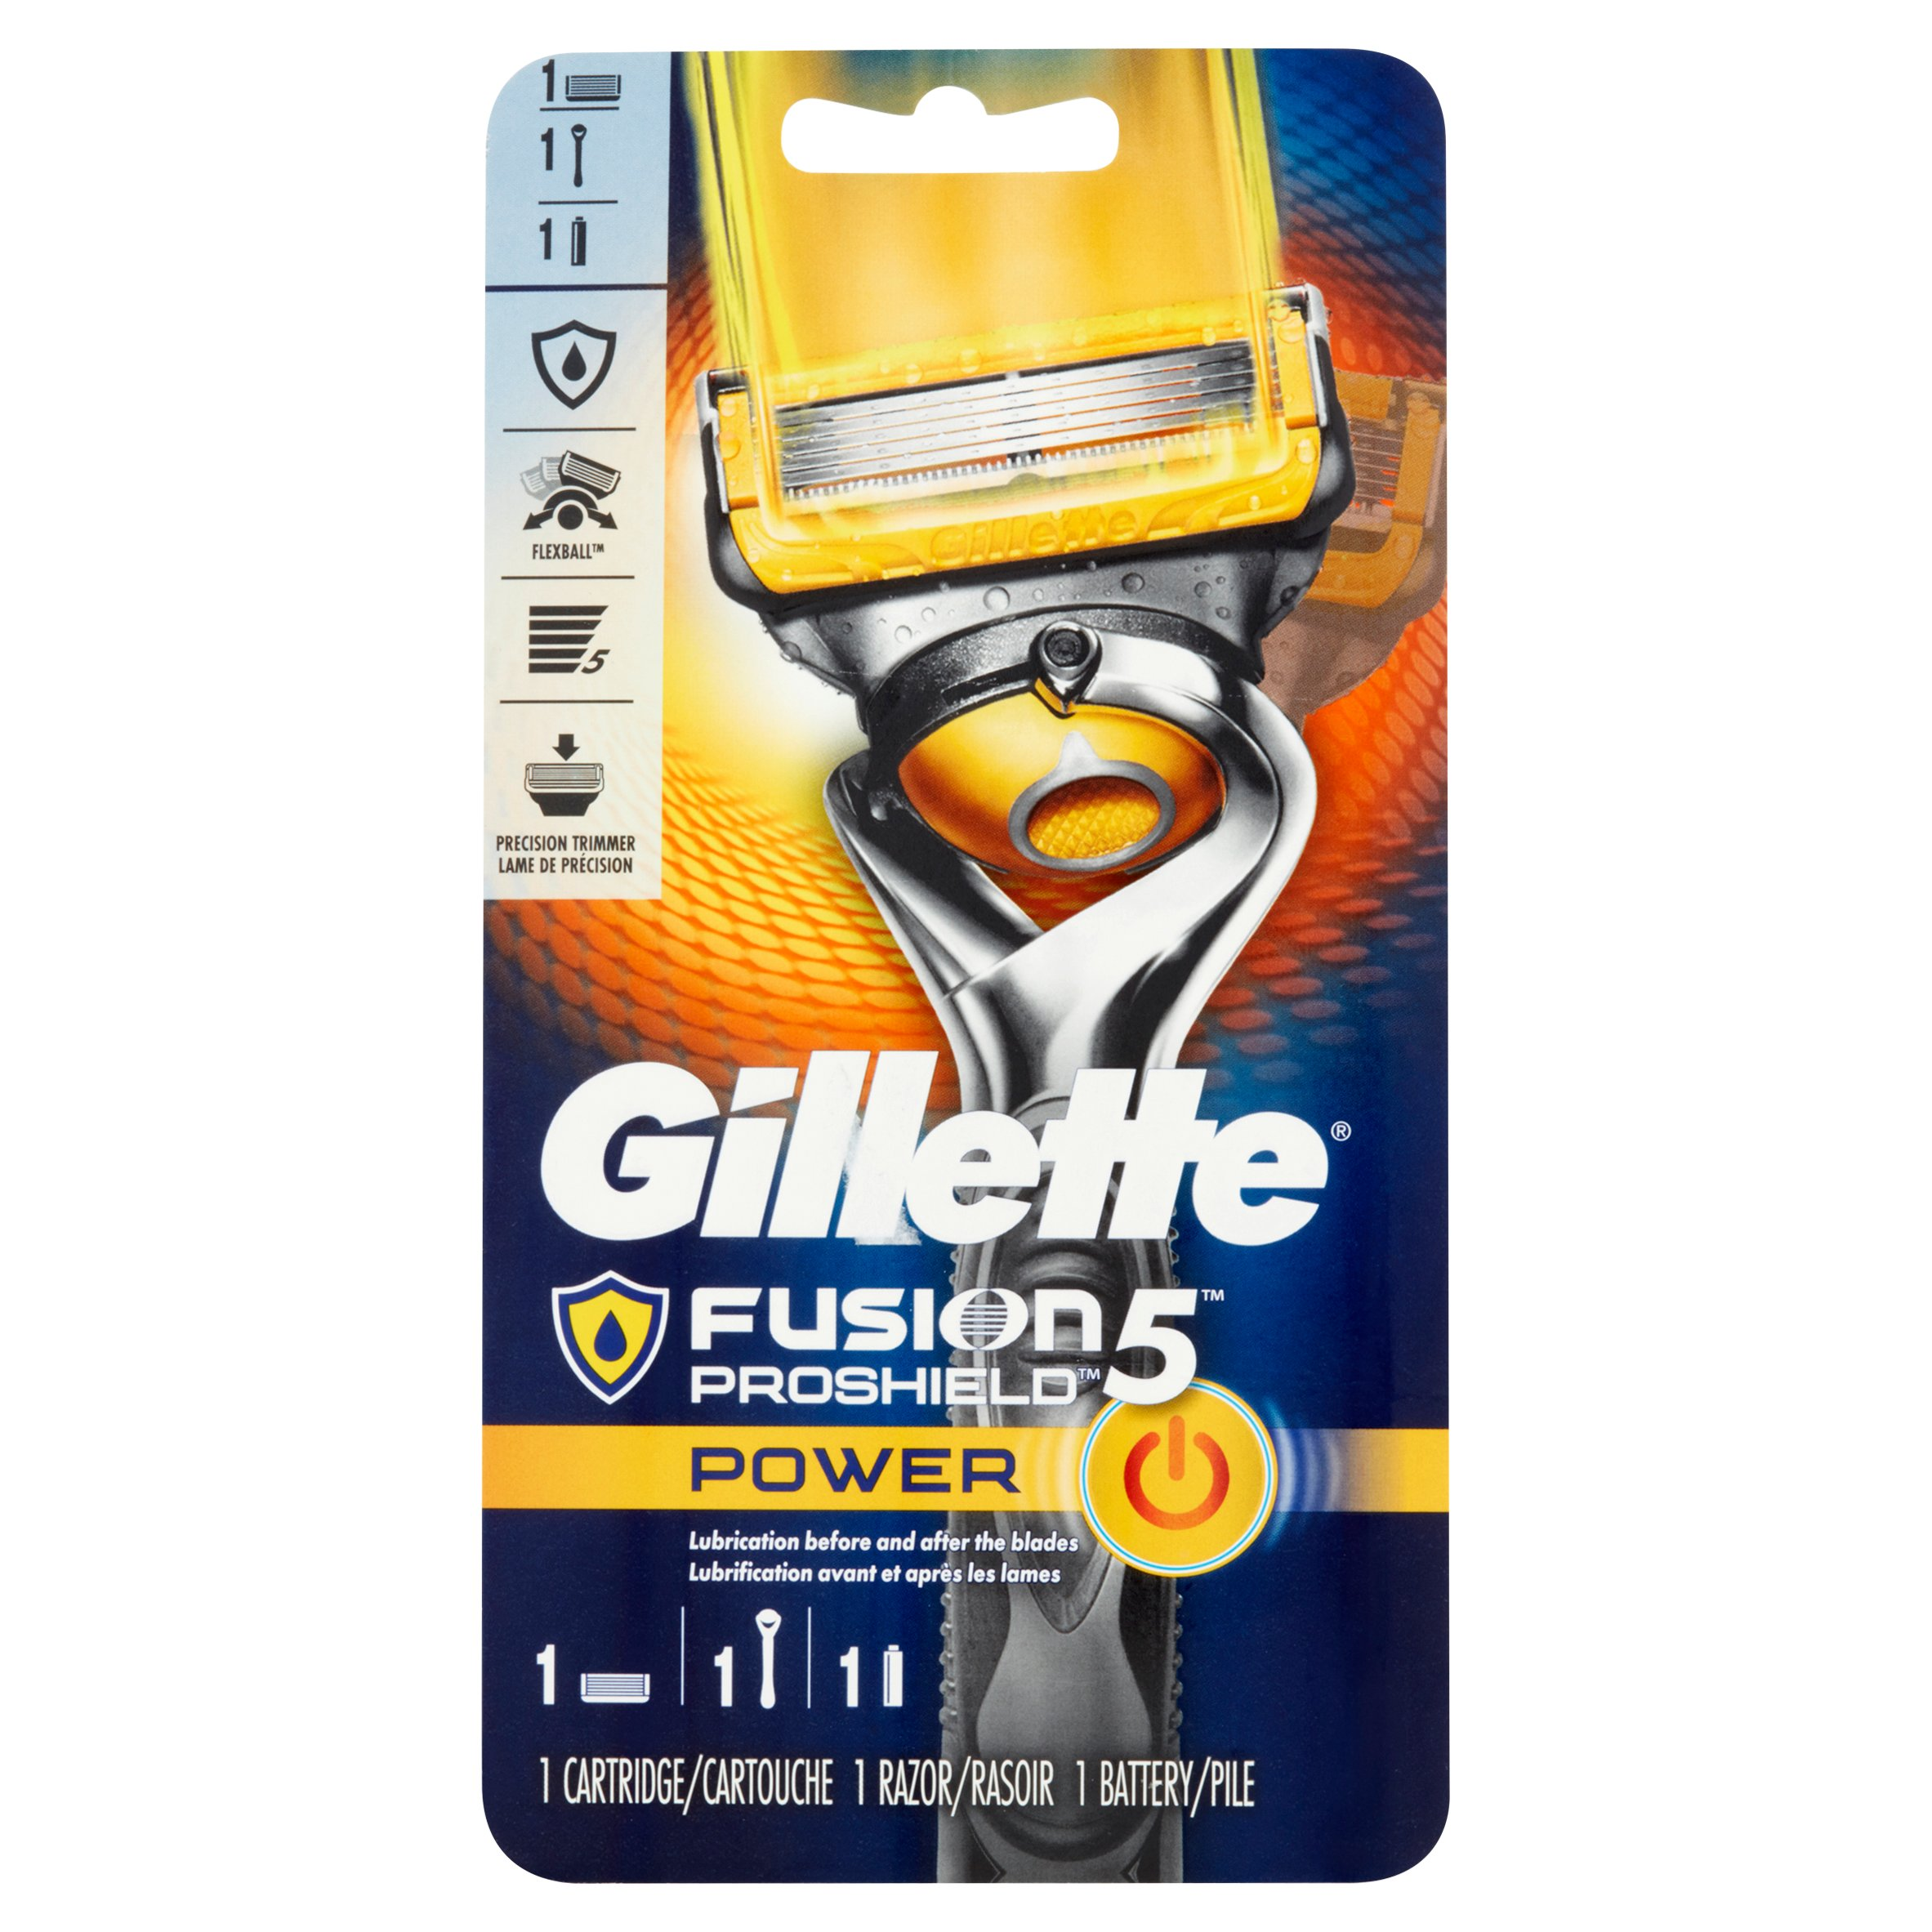 Gillette Fusion5 ProShield Power Cartridge, Razor and Battery